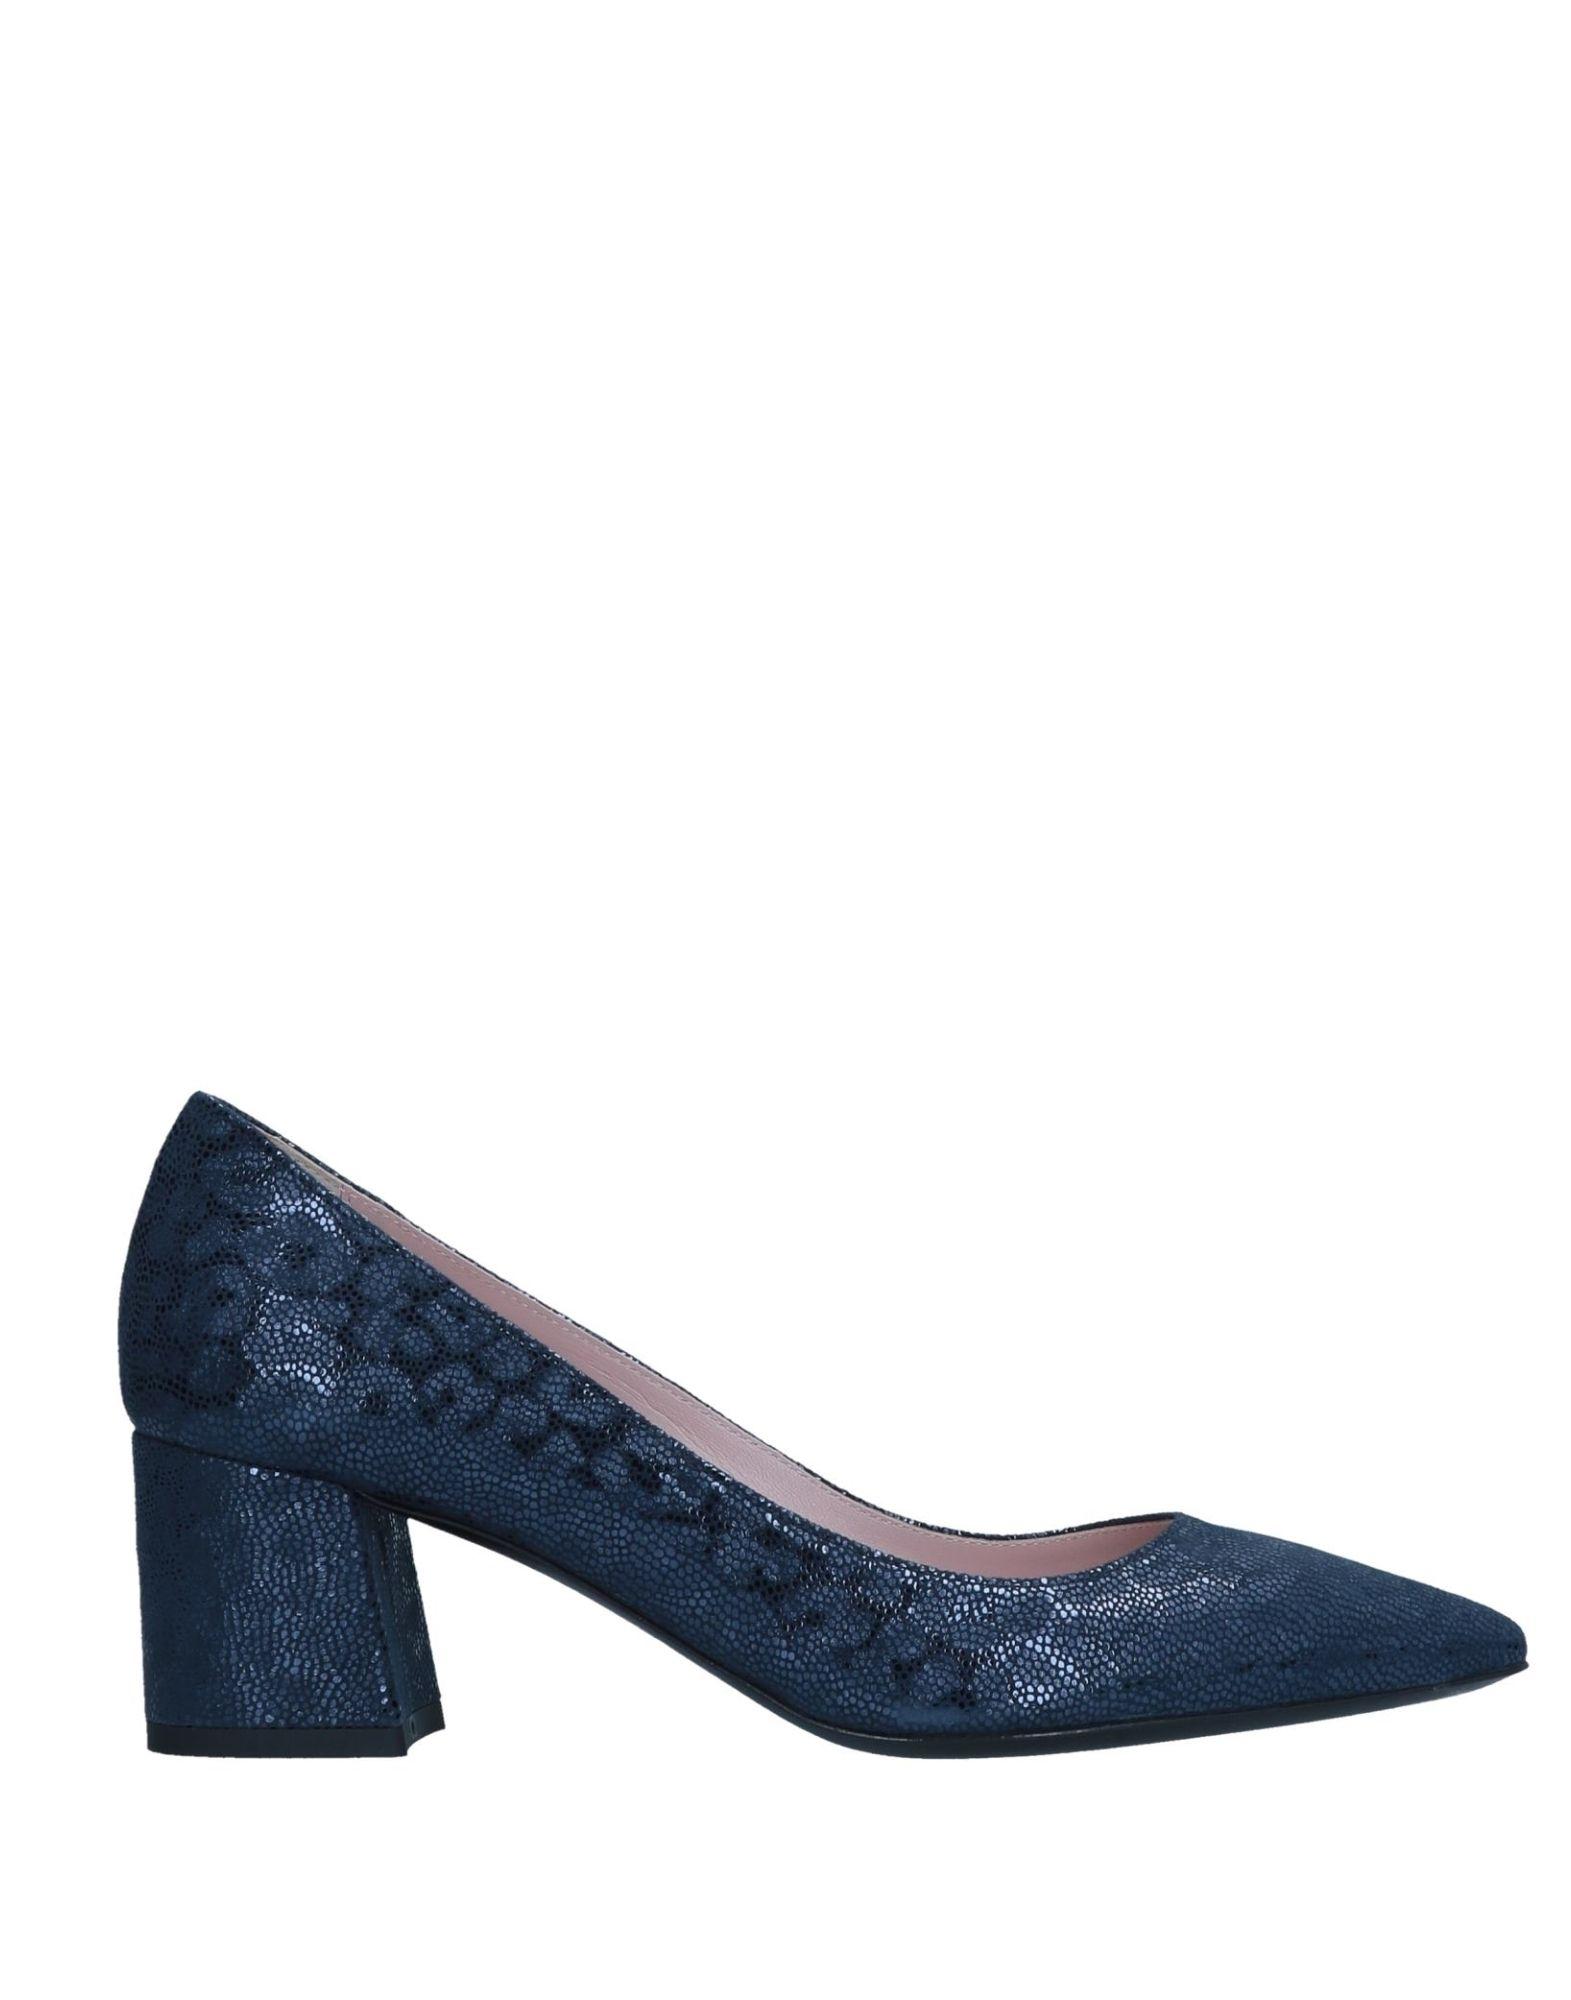 Fauzian Jeunesse Pumps Damen  11548559BXGut aussehende strapazierfähige Schuhe